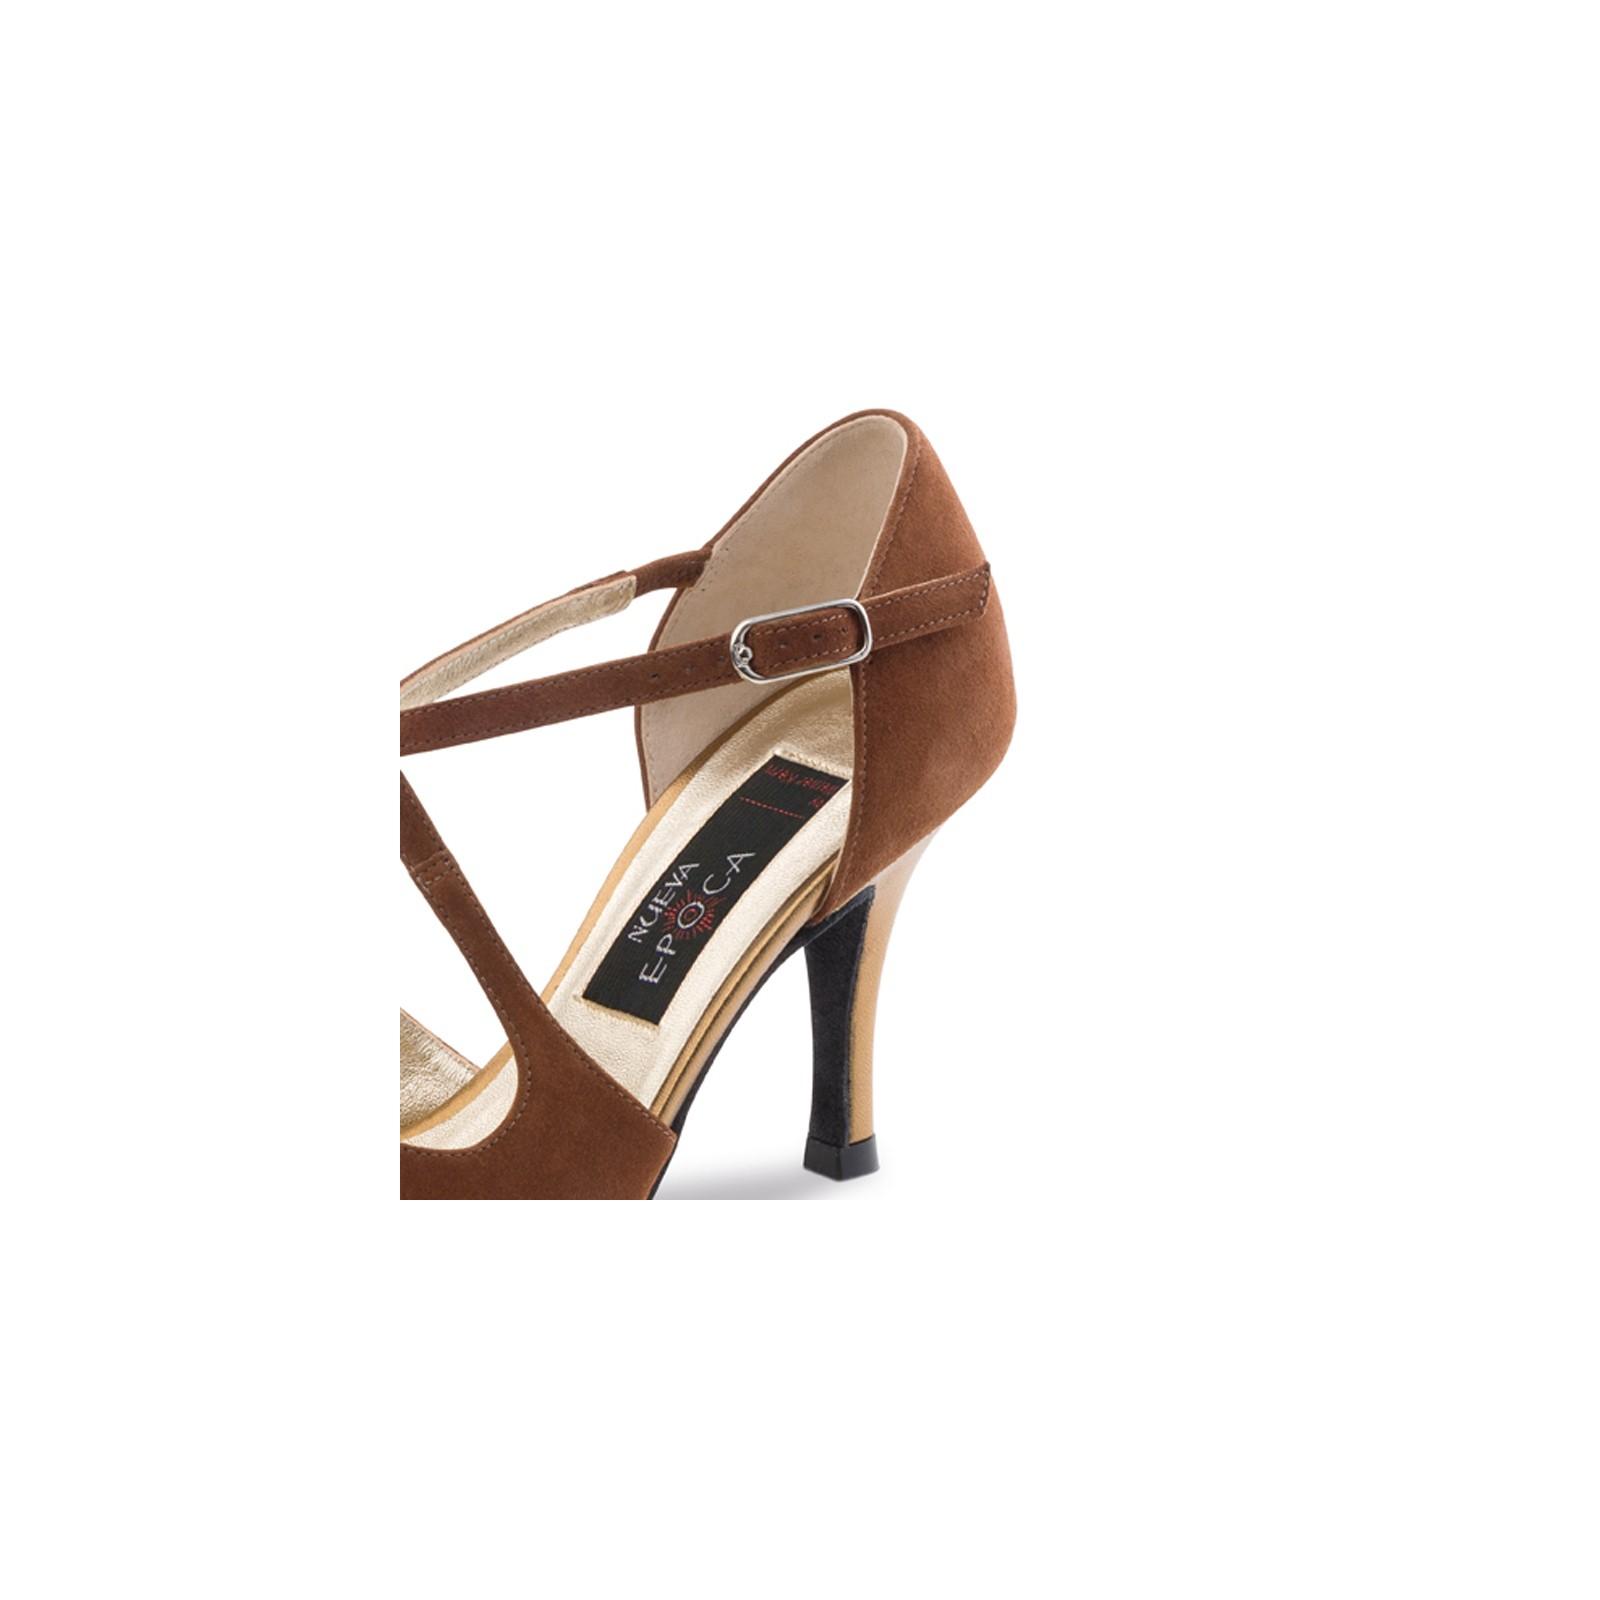 Nueva Chaussures Werner Tessa Kern De Label Danse Epoca H14EFw1x